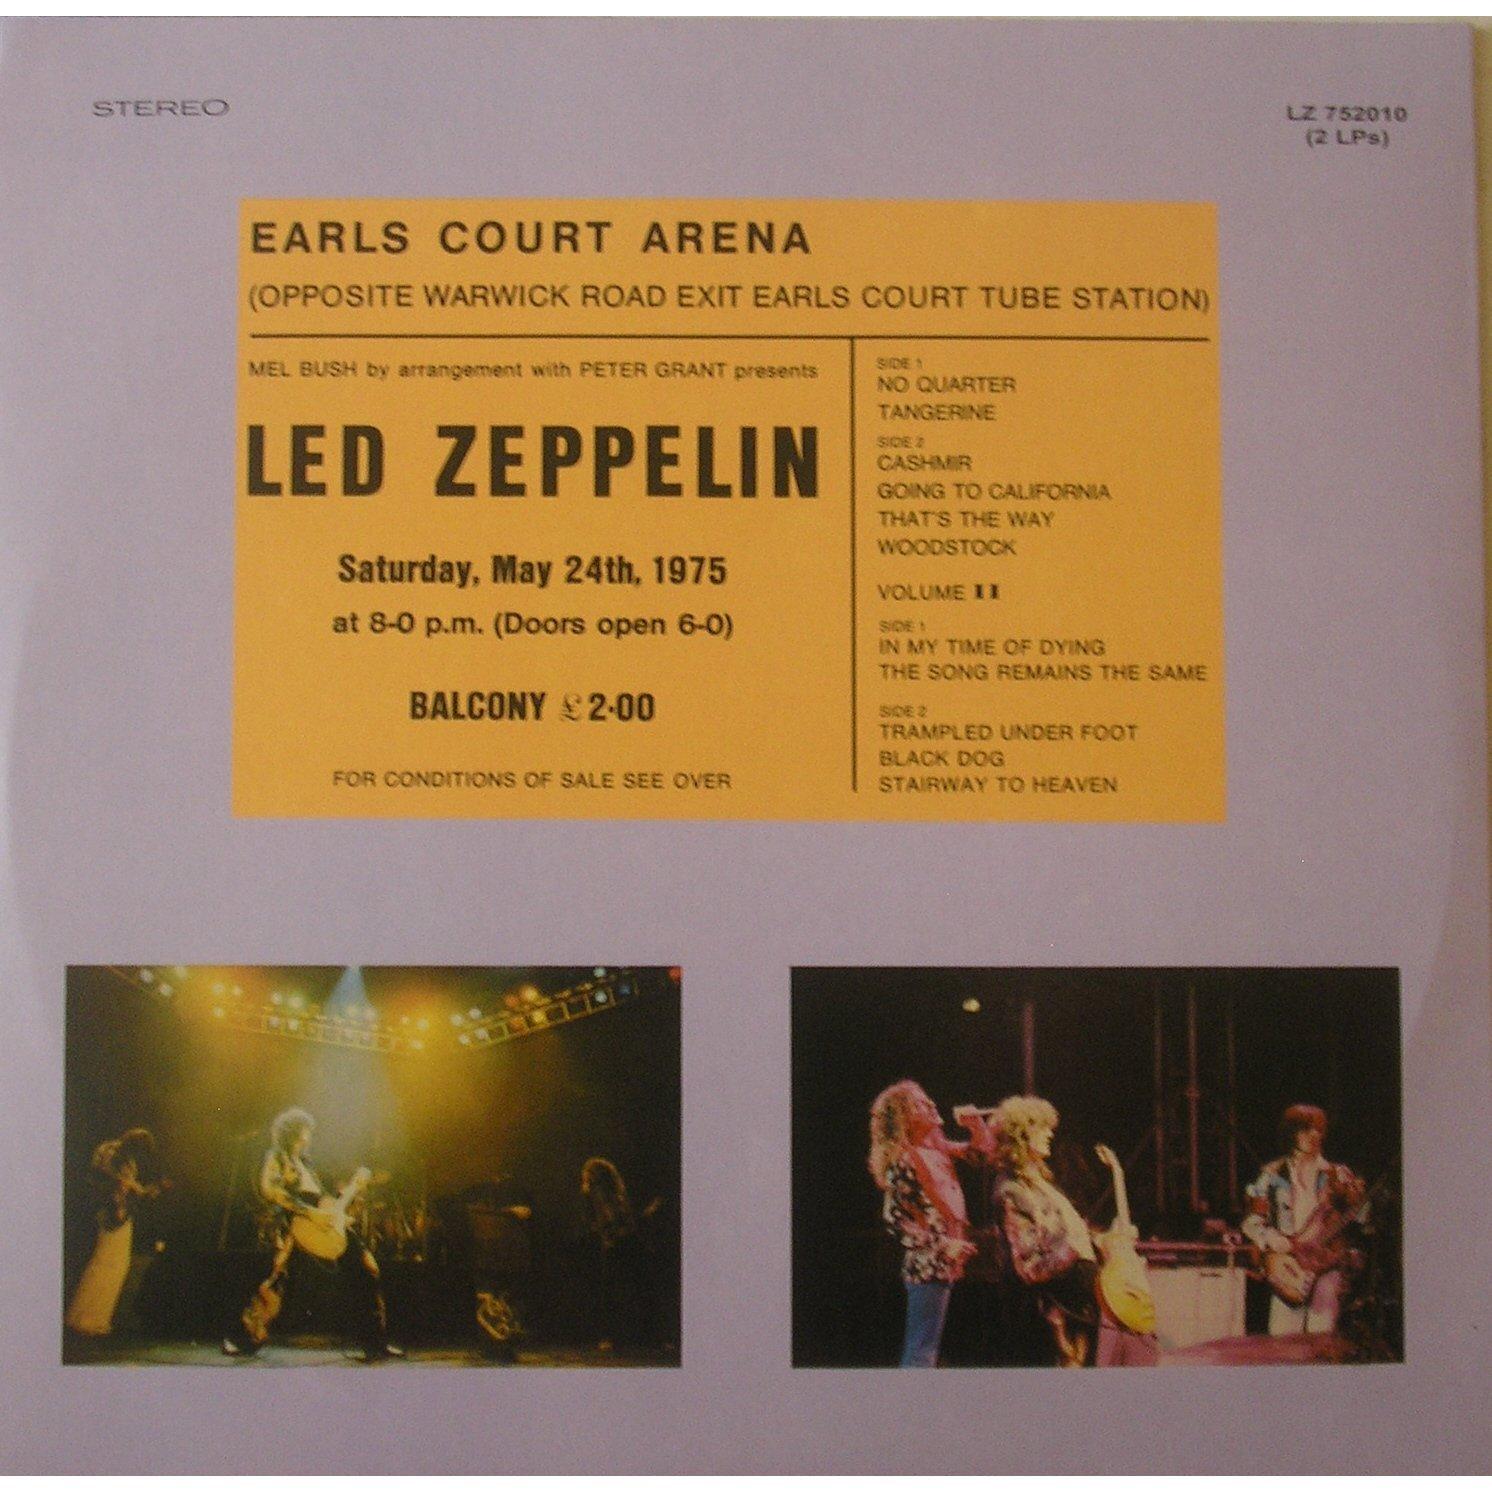 Earl S Court Vinyl Couleur By Led Zeppelin Lp X 2 With